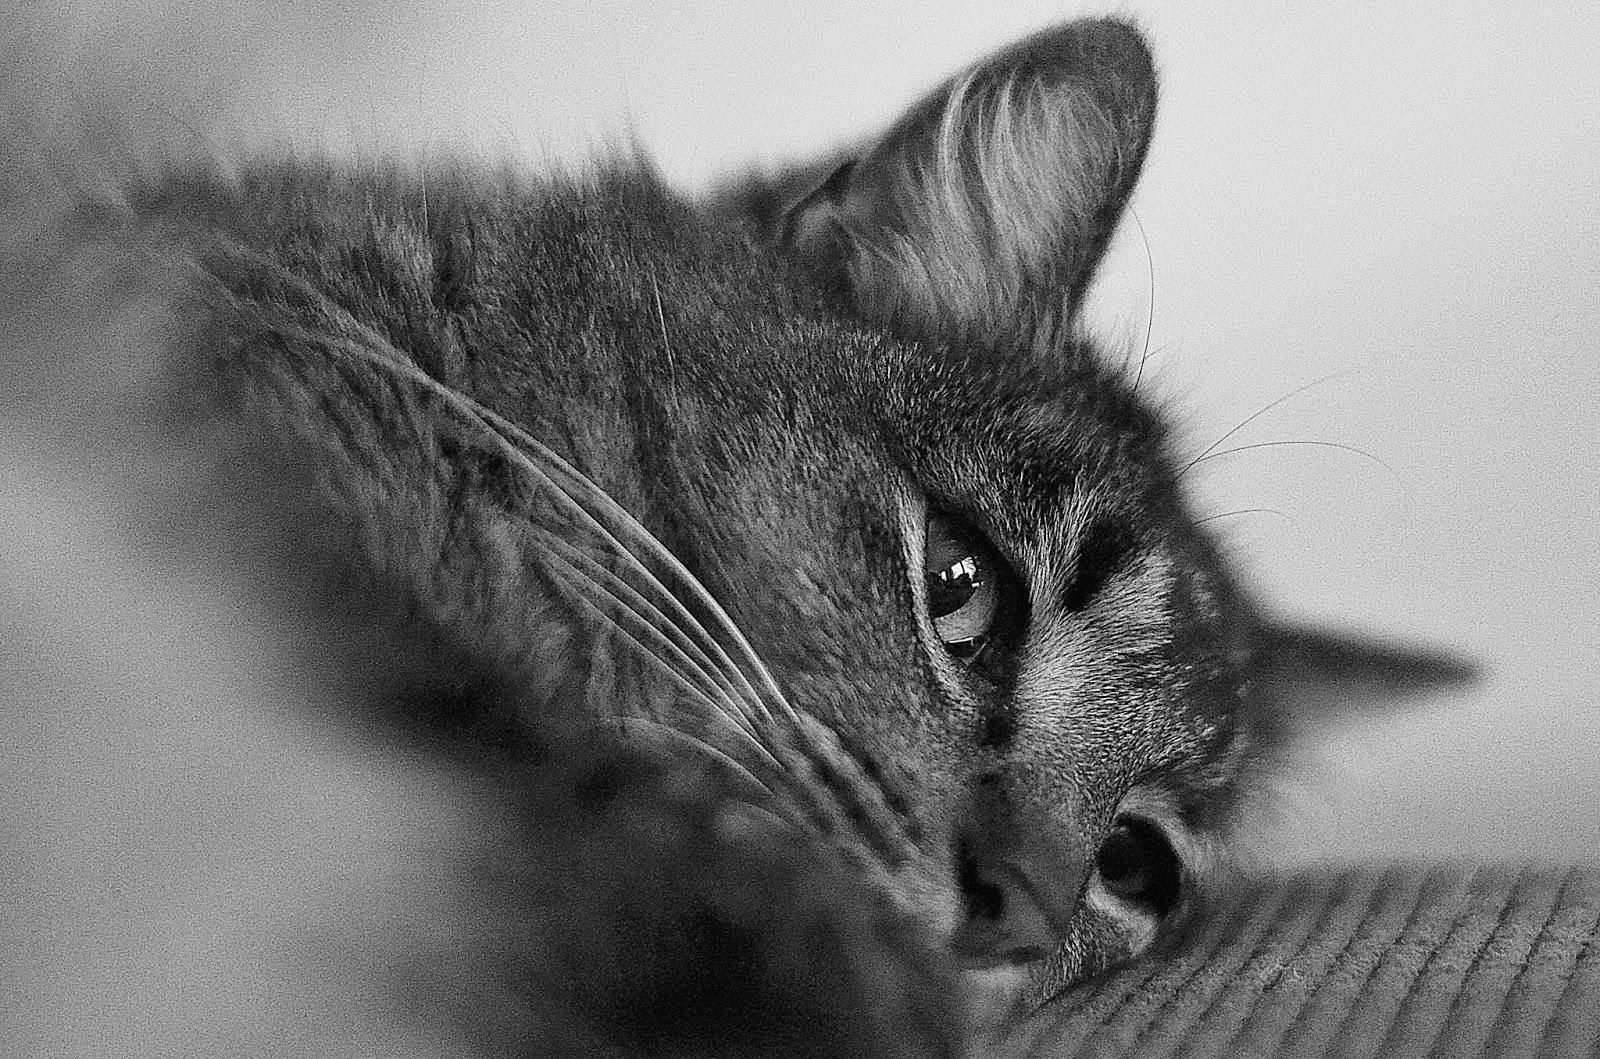 cat, black and white, photograph, katt, fotograf, photographer, close up, djur, husdjur, närbild, svartvit, svartvitt